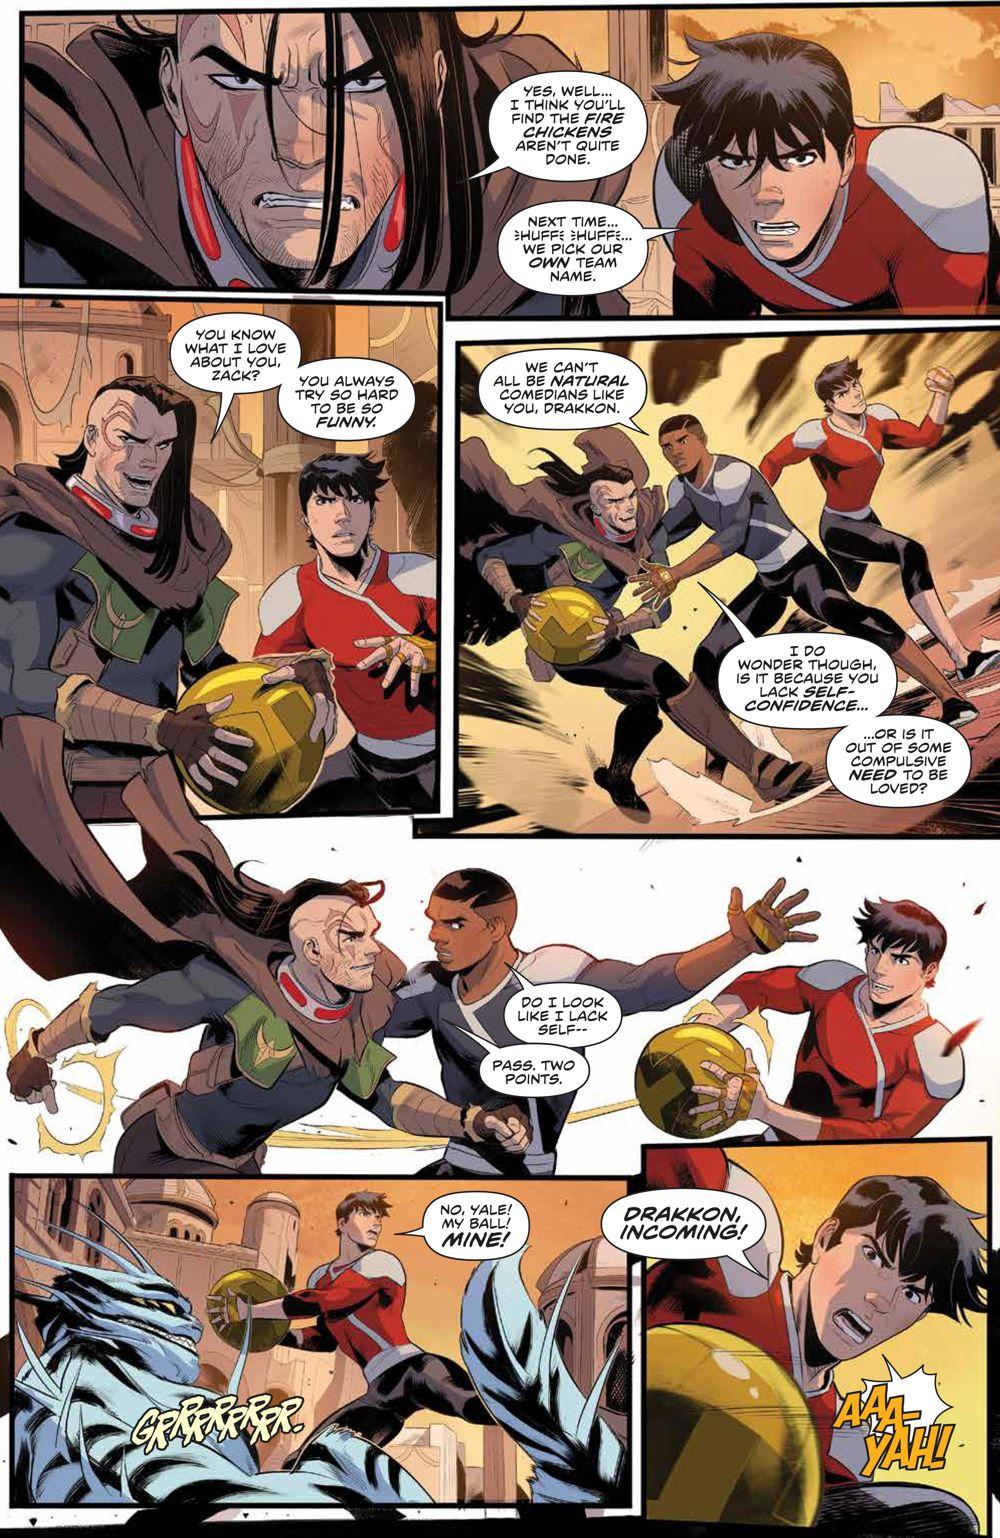 PowerRangers_007_PRESS_4 ComicList Previews: POWER RANGERS #7